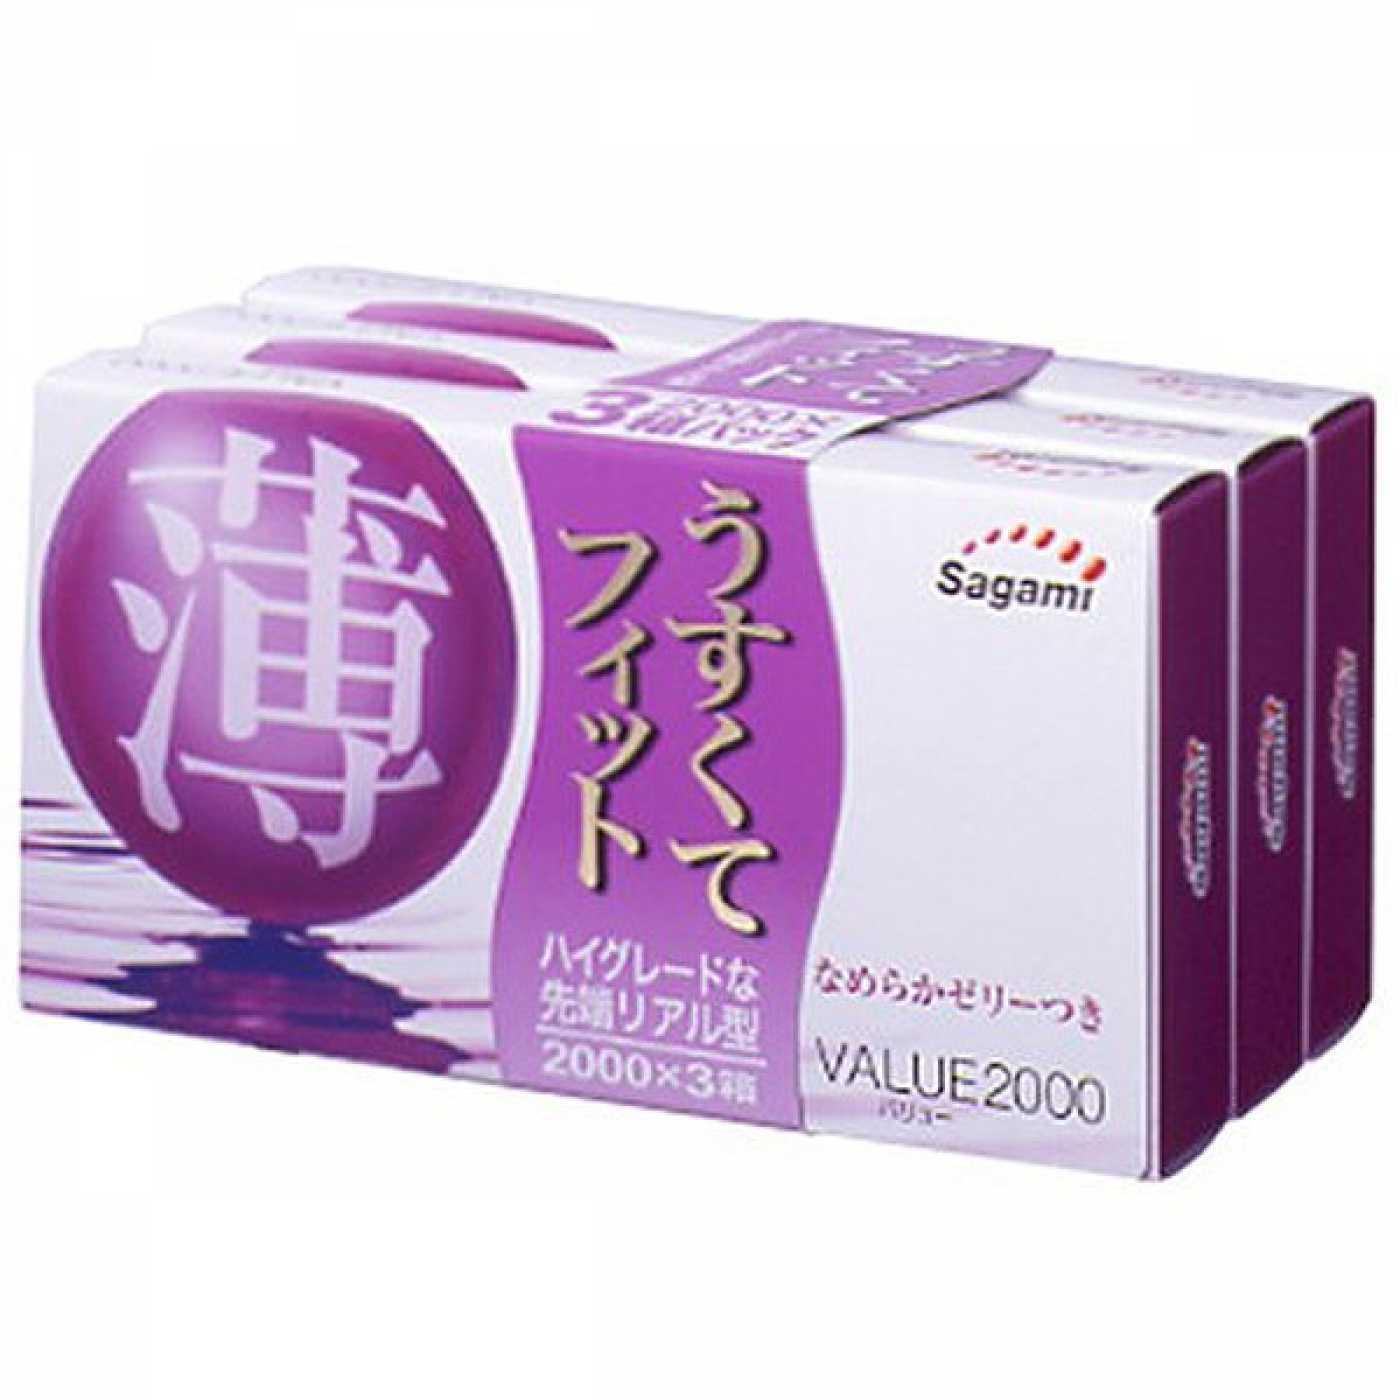 Презерватив Sagami Value Pack 2000 - 1 шт